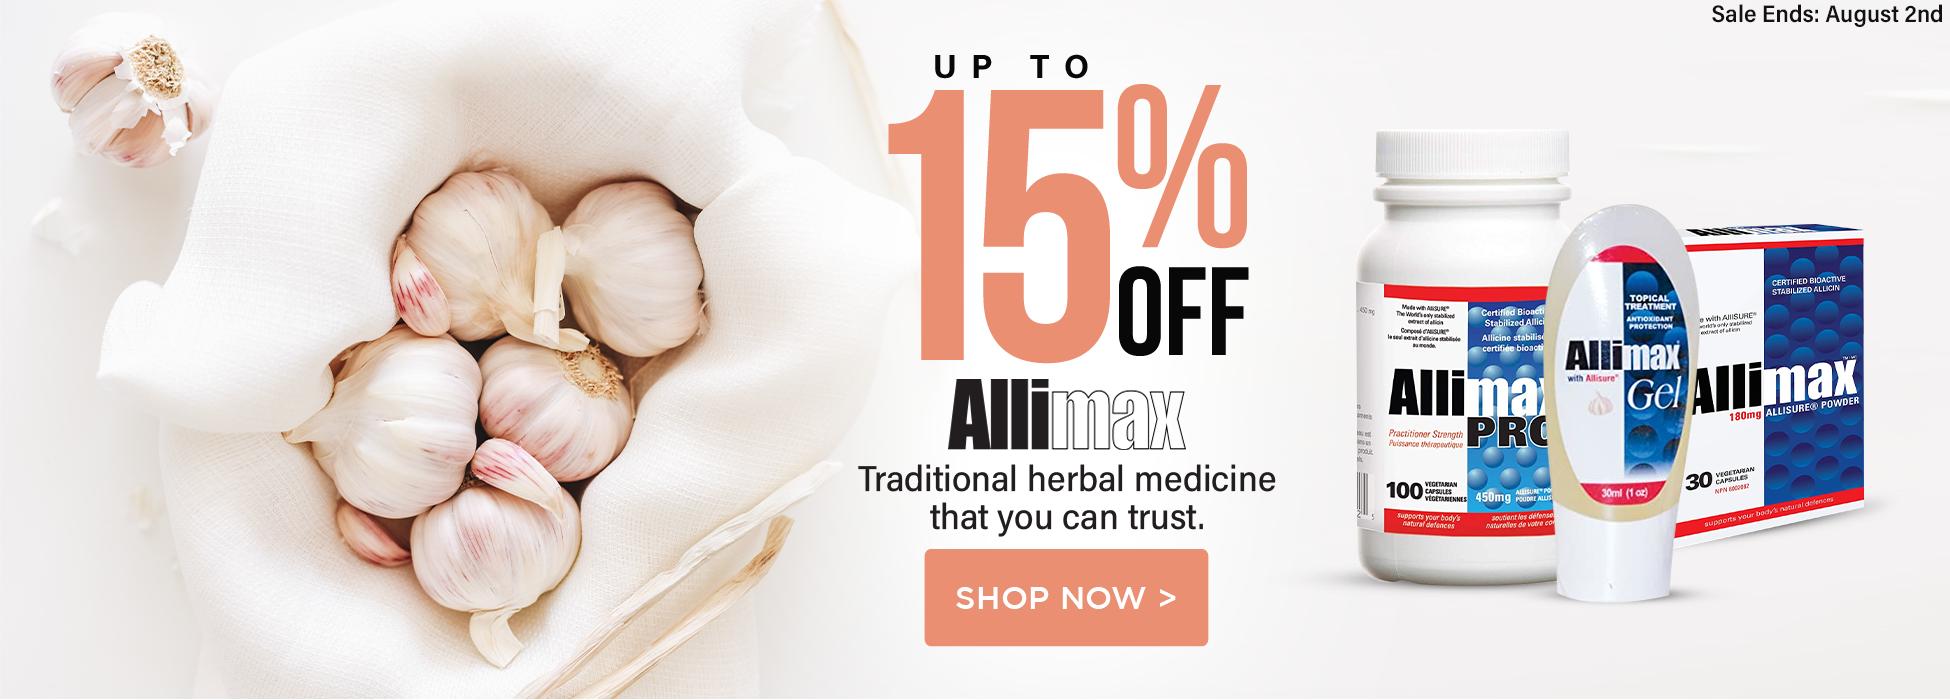 allimax herbal medicine sale